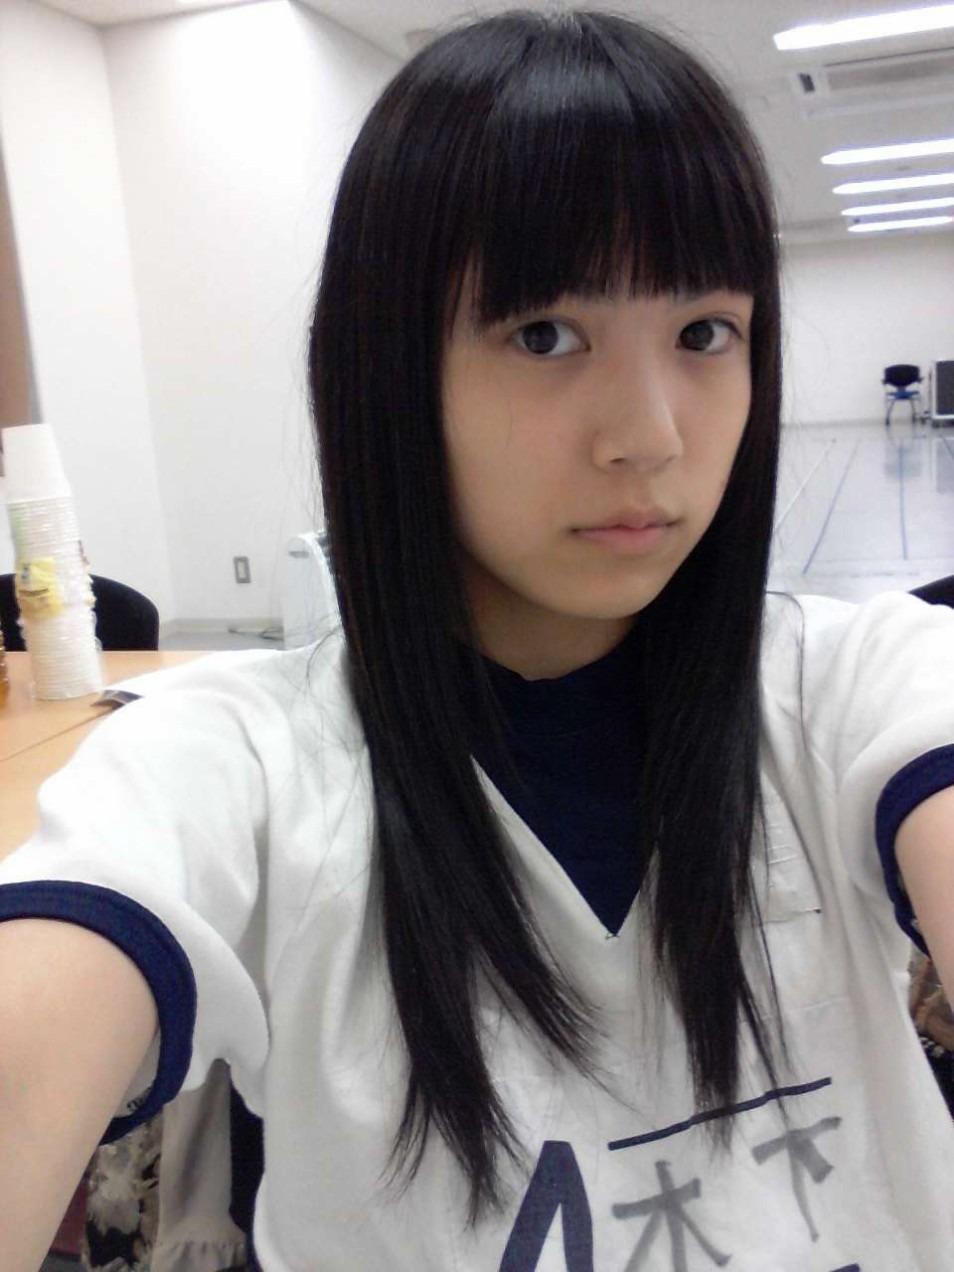 AKB48・島田晴香がドラマ『豆腐プロレス』でダイエット成功の水着グラビア披露!キャストもユニーク!